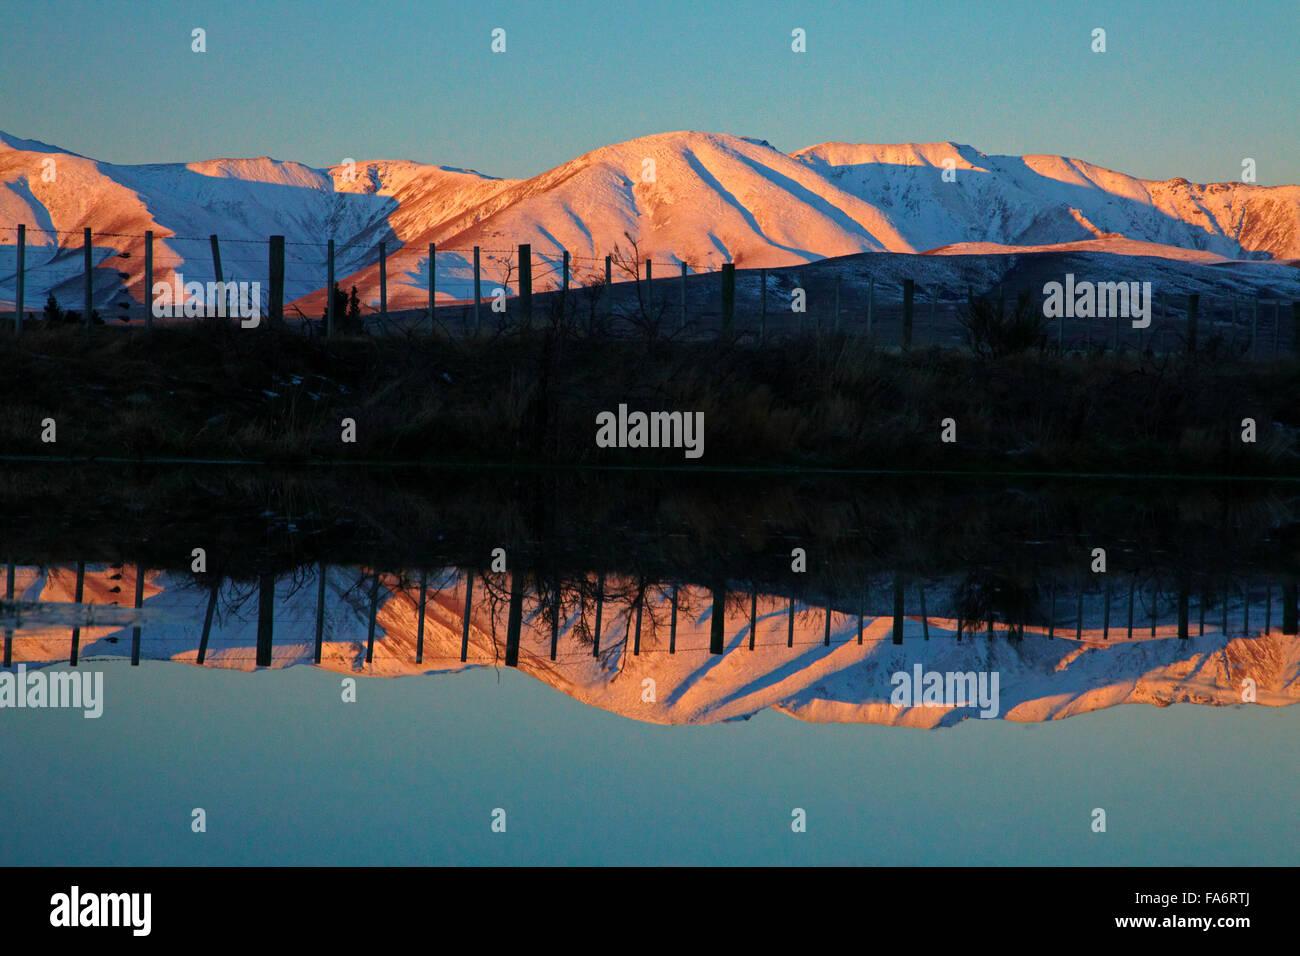 Alpenglow on Ida Range, Maniototo, Central Otago, South Island, New Zealand - Stock Image